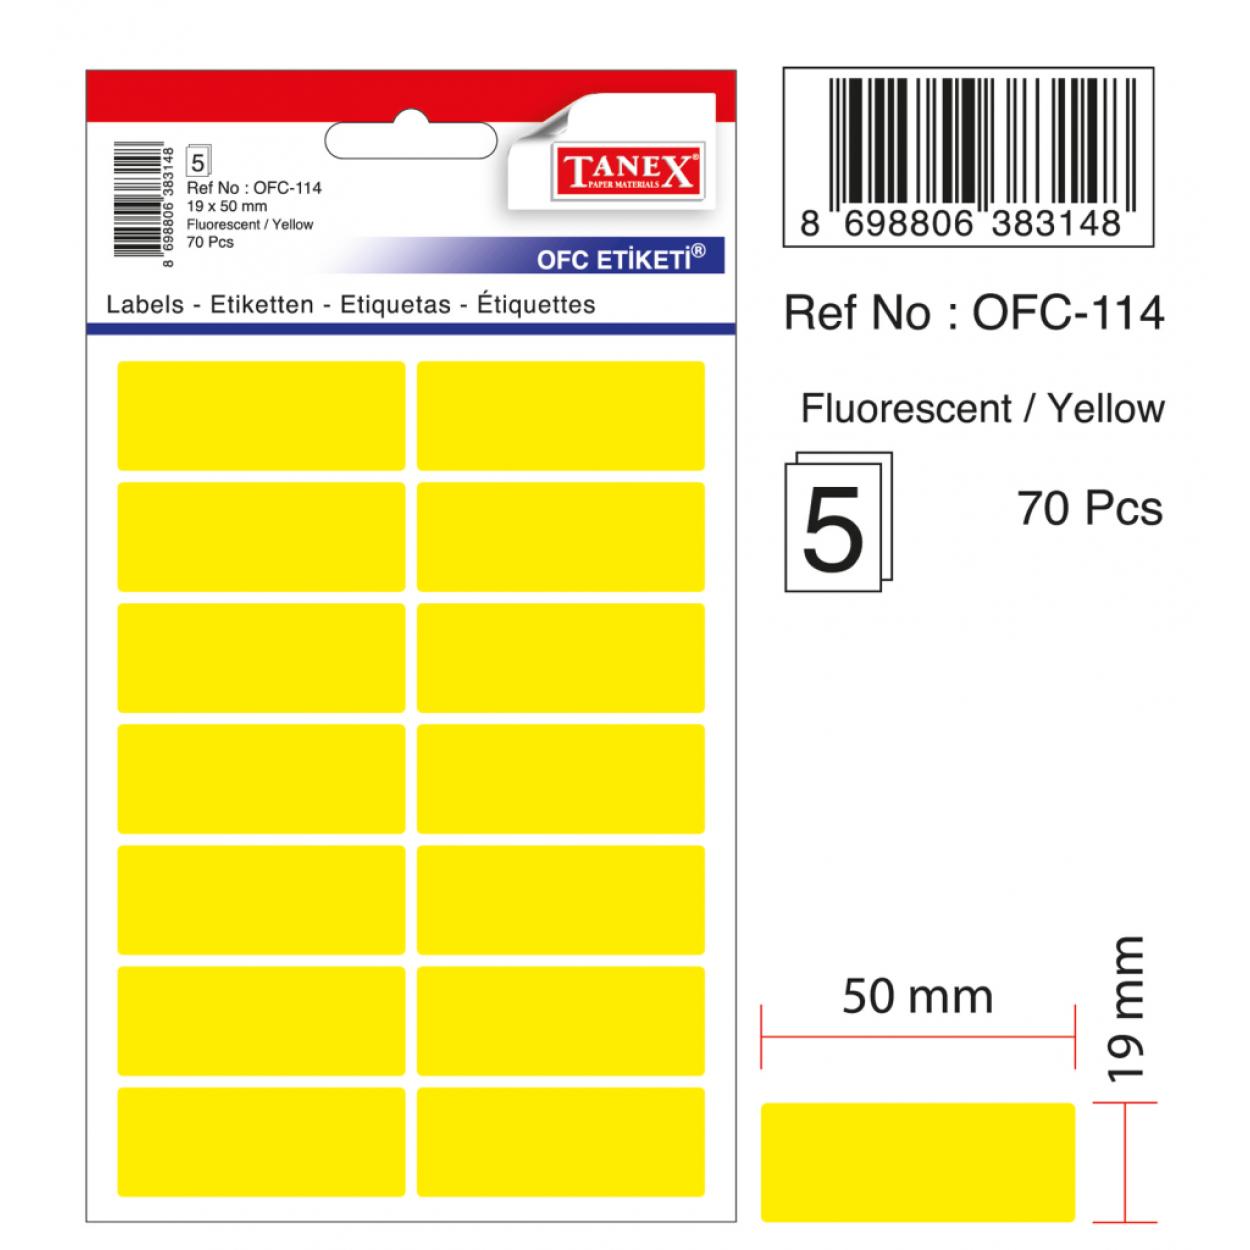 Tanex Ofc-114 Flo Sarı Ofis Etiketi